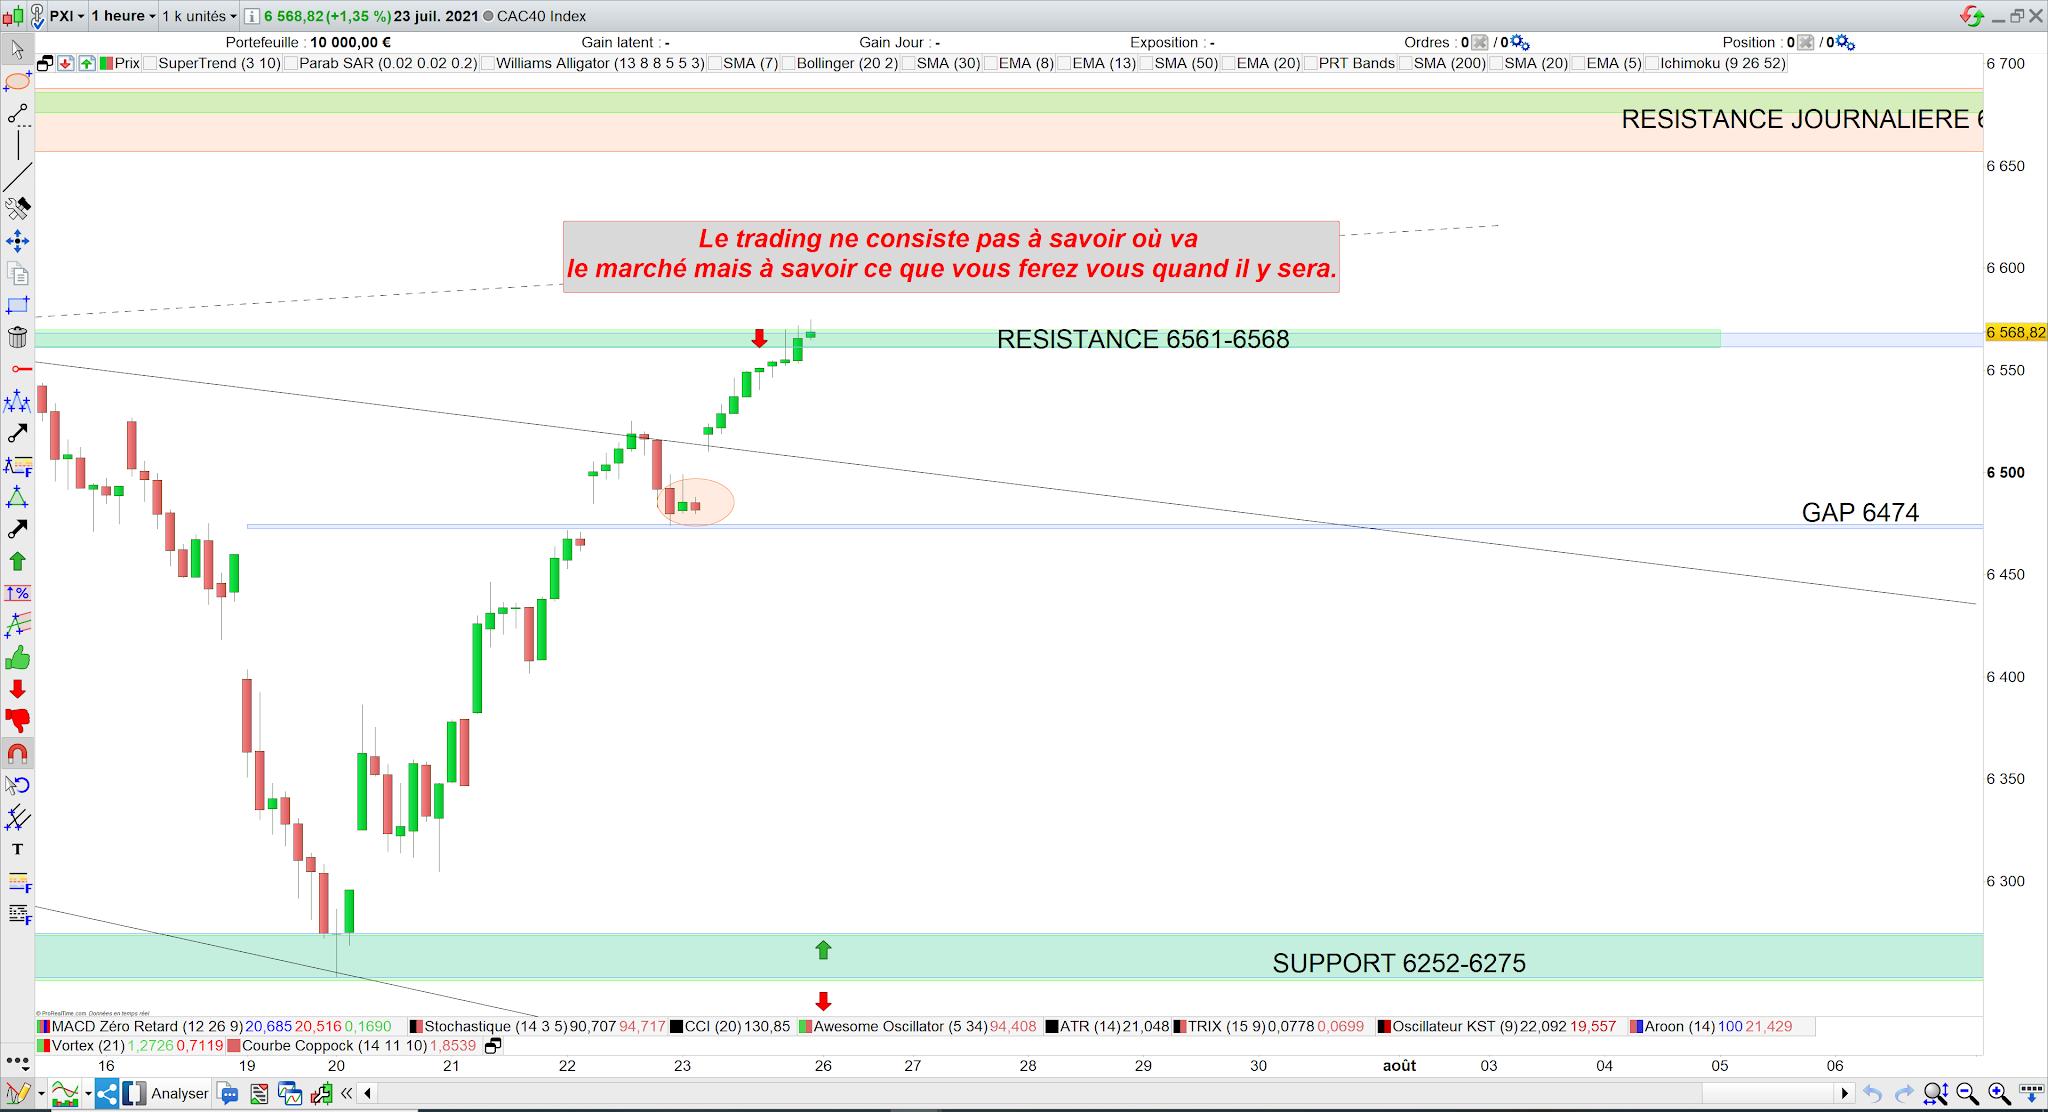 Bilan trading cac40 23/07/21